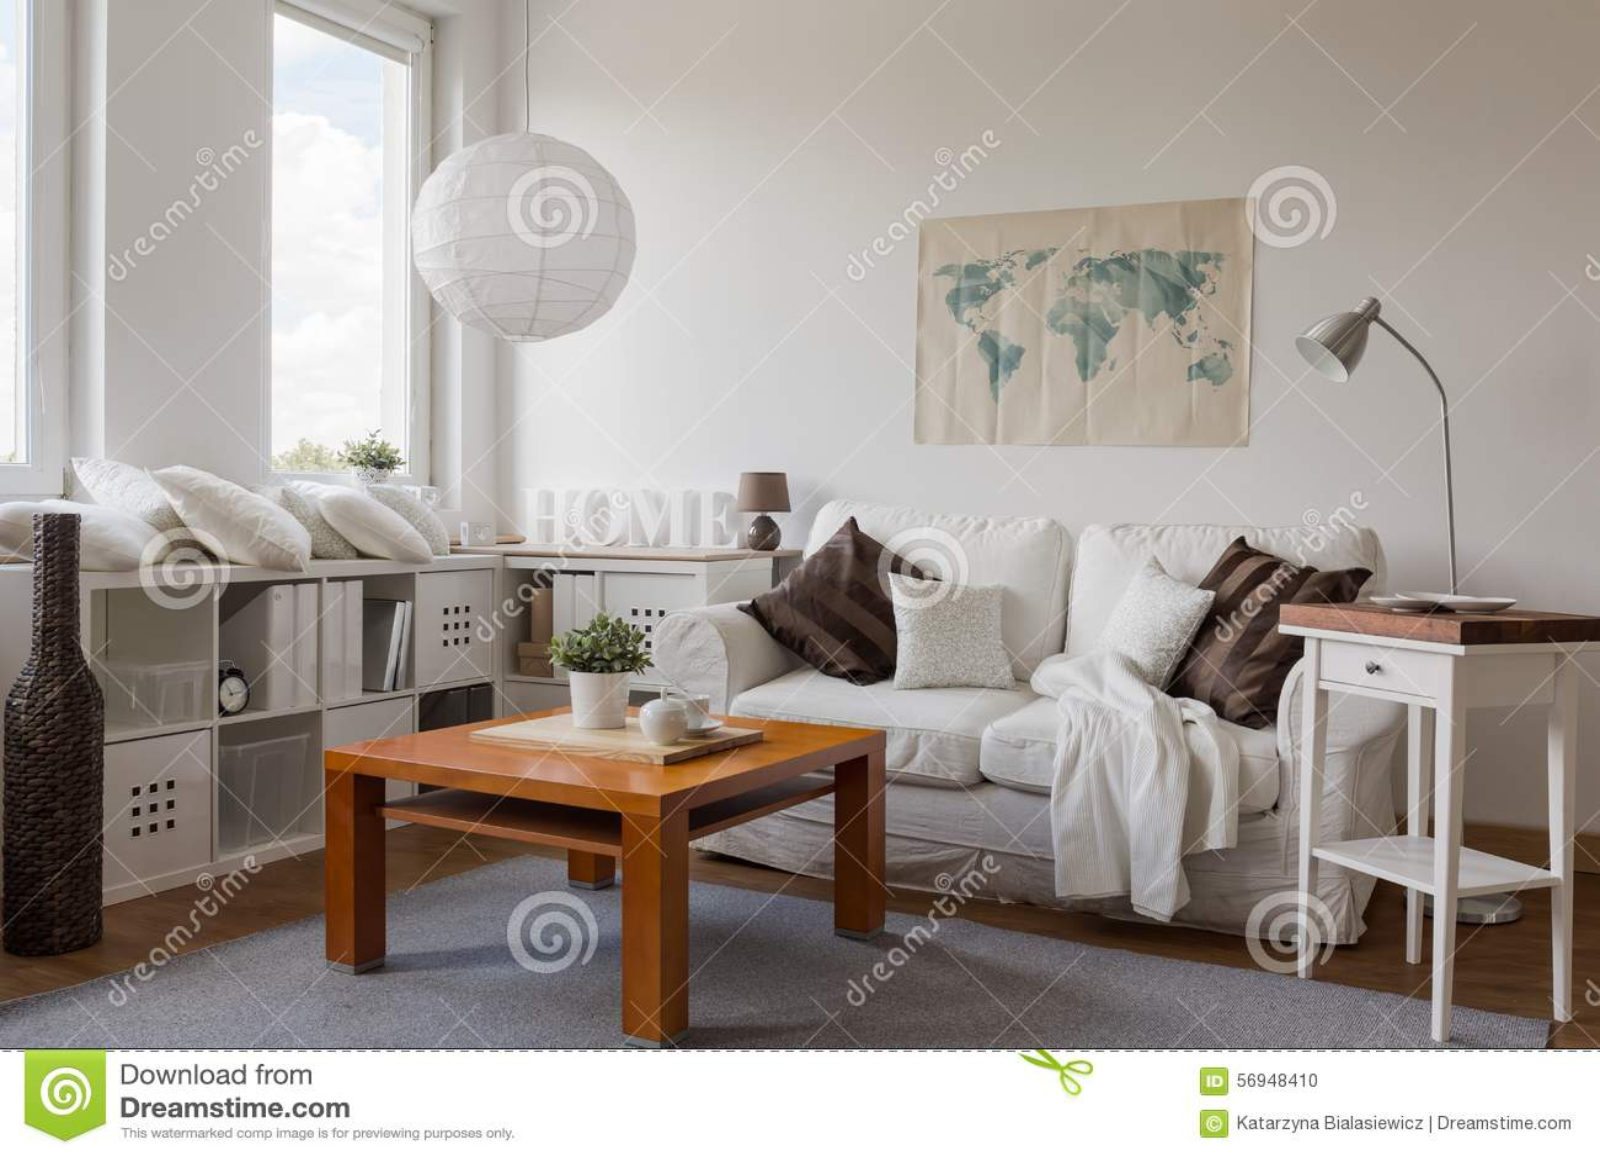 Woonkamer In Wit Stock Foto - Afbeelding: 56948410